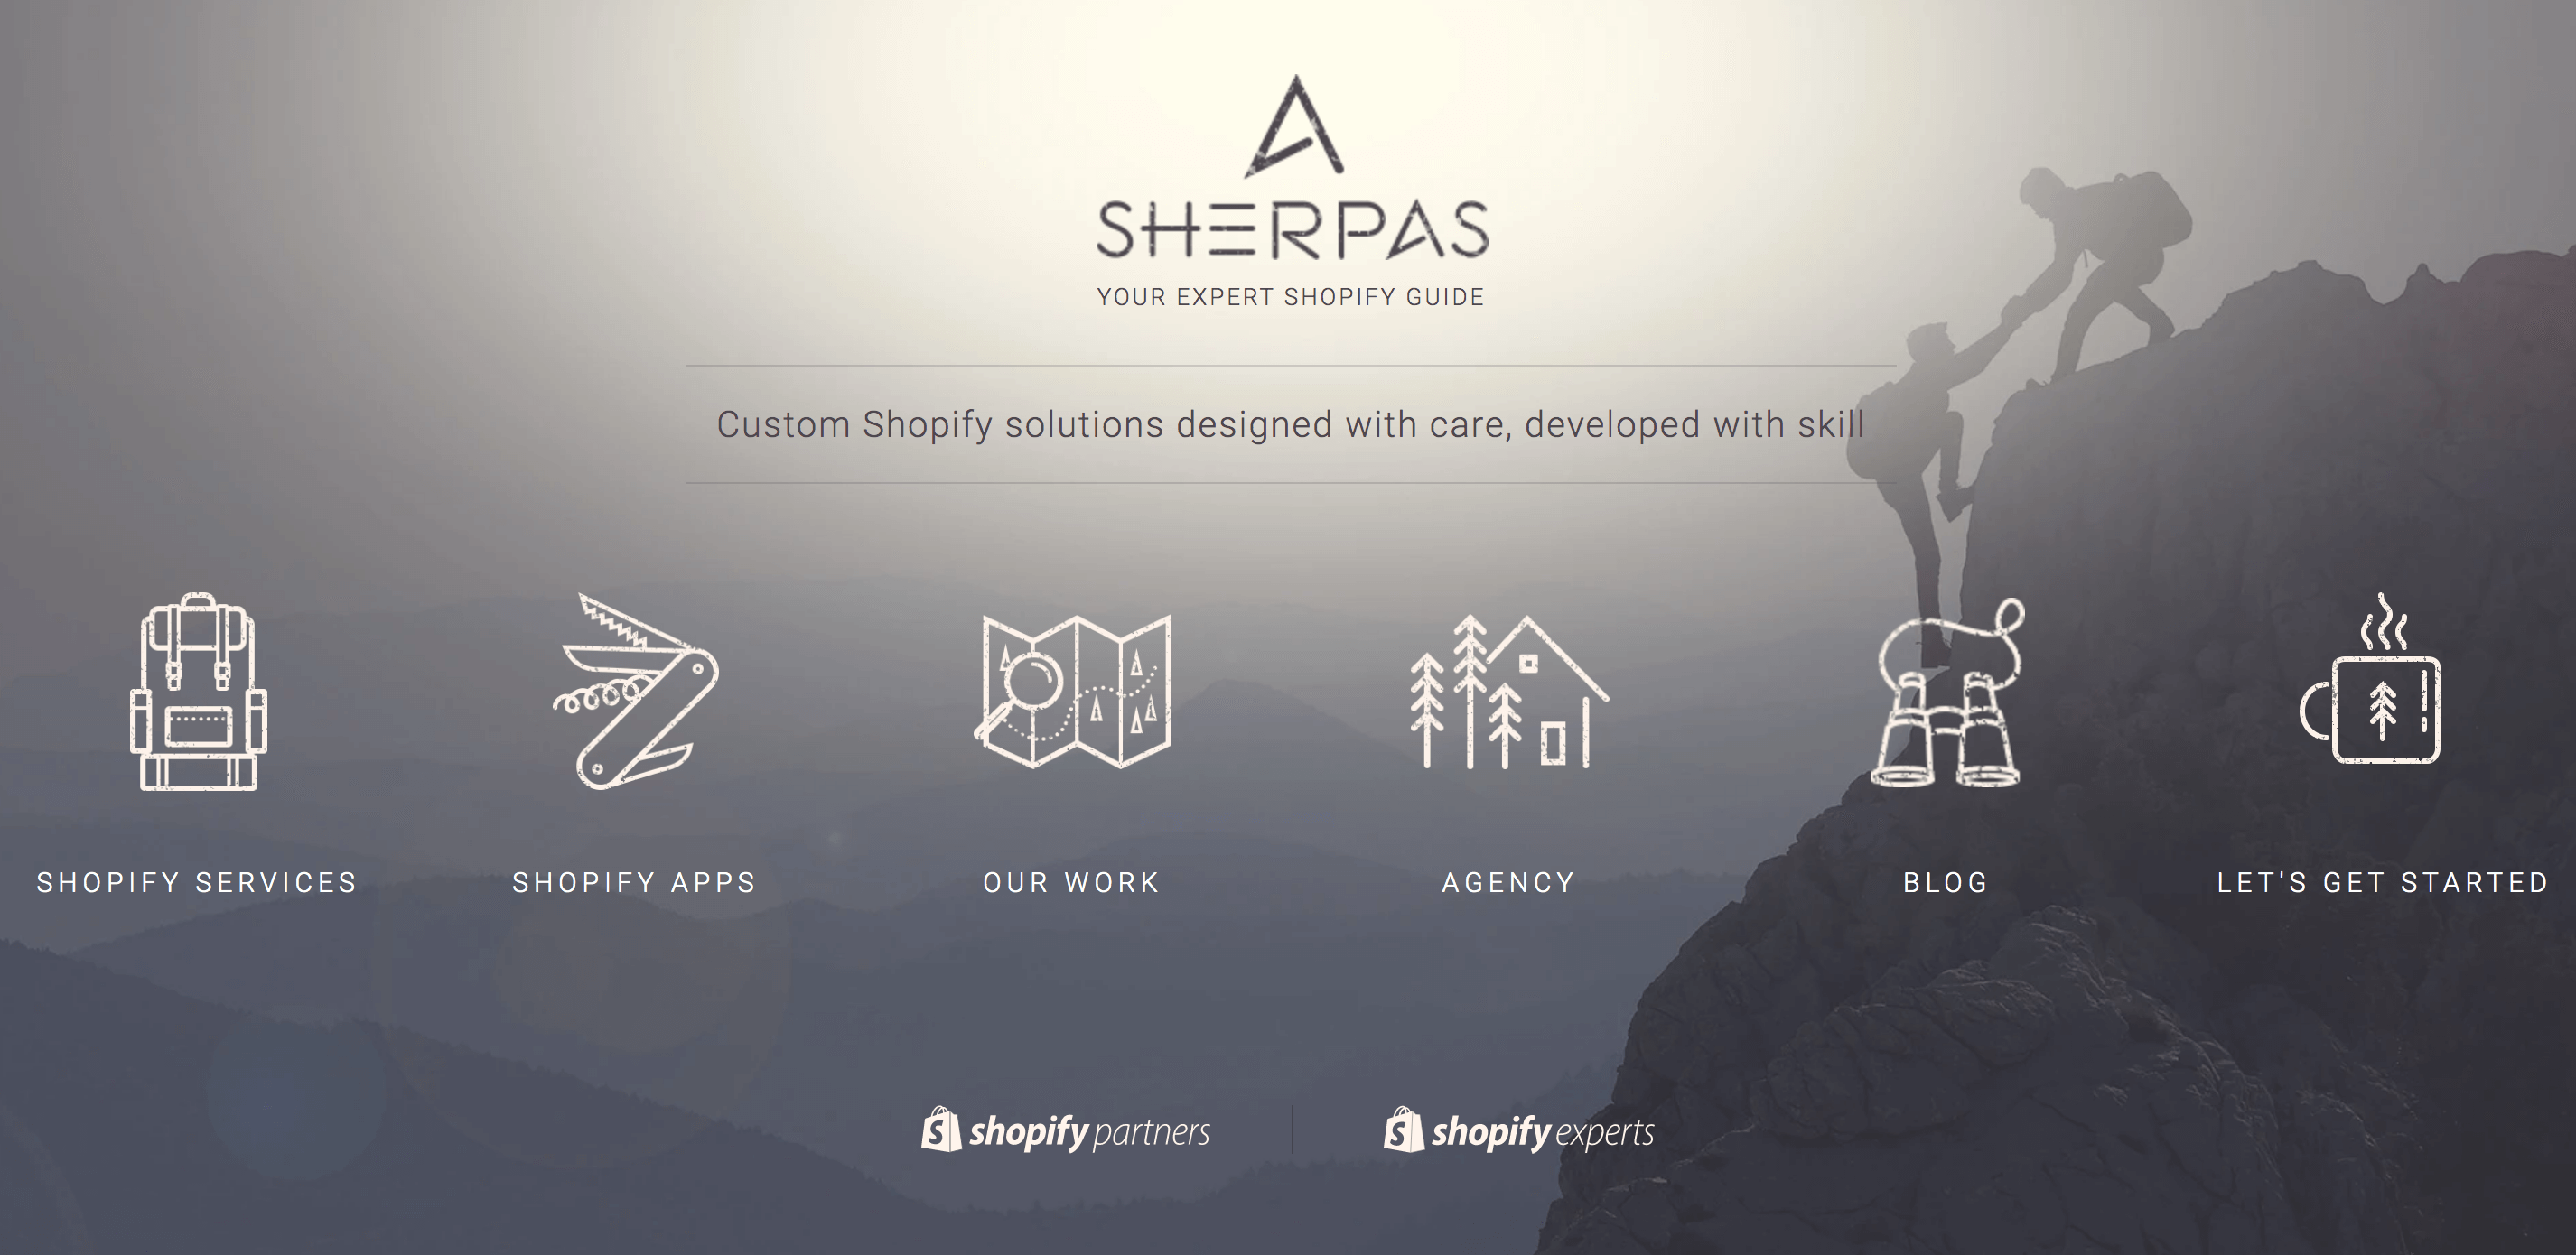 Top Shopify Apps Sherpas